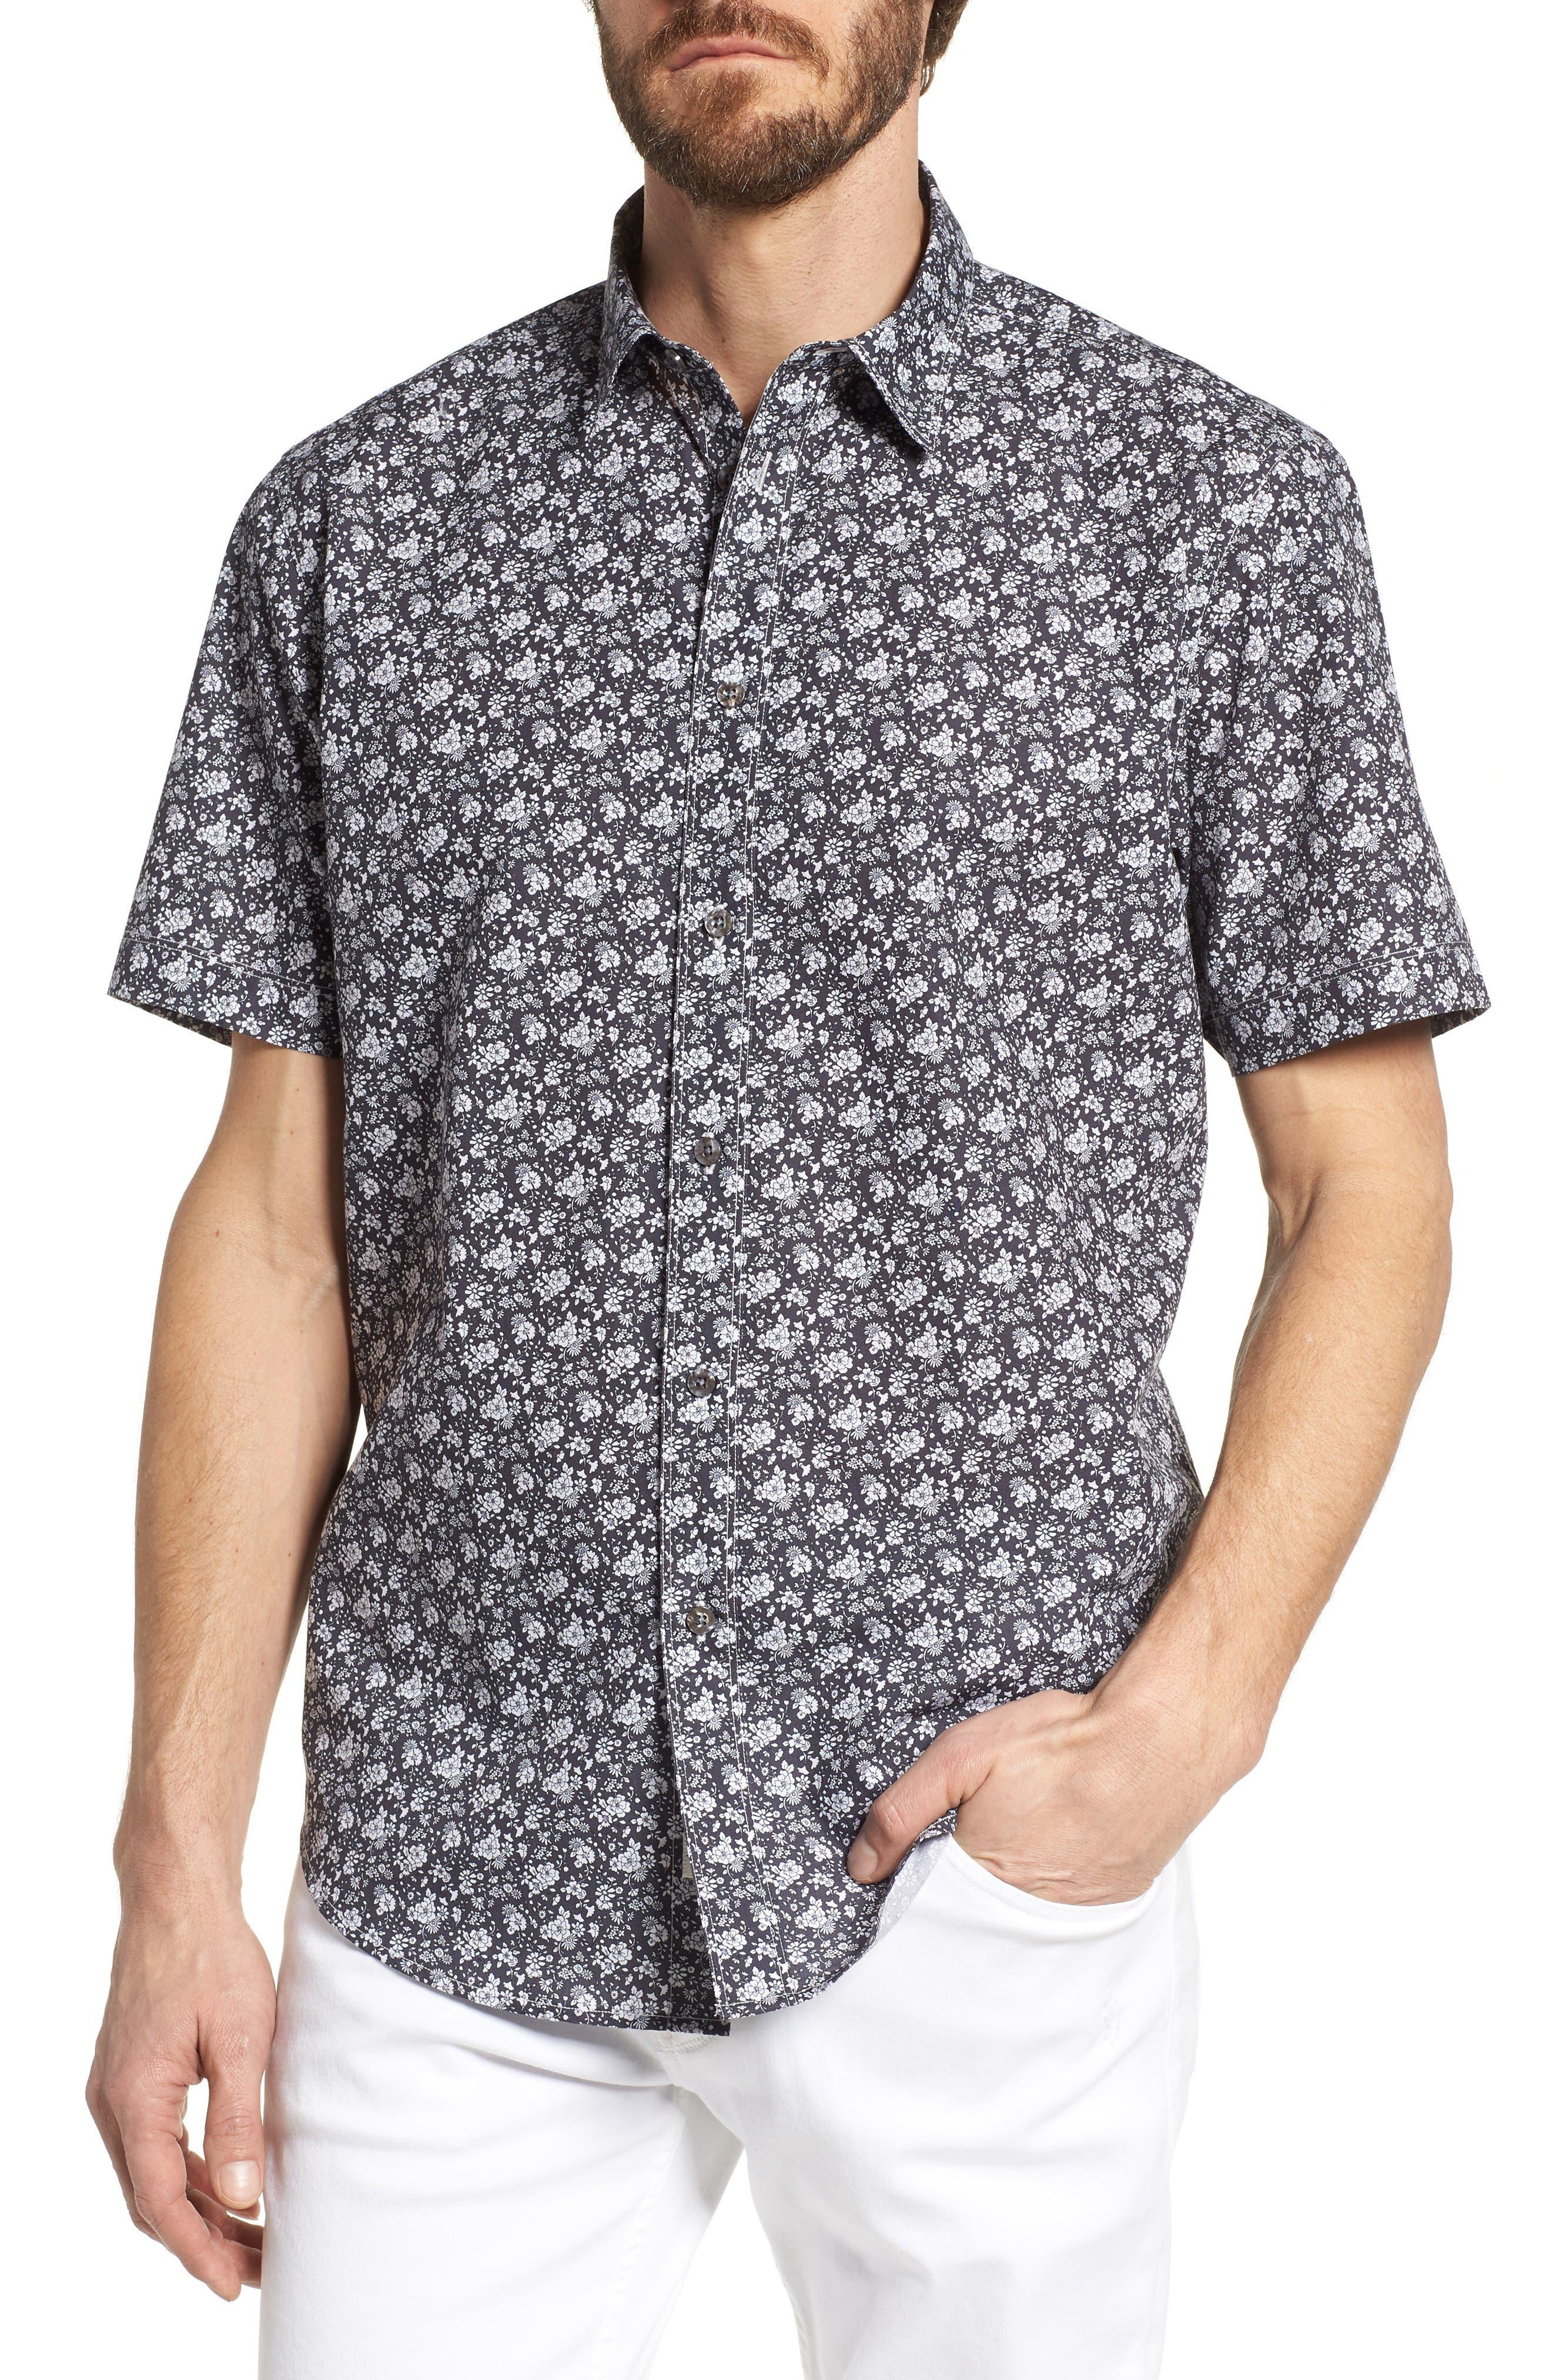 Coastaoro Hidalgo Regular Fit Print Short Sleeve Sport Shirt